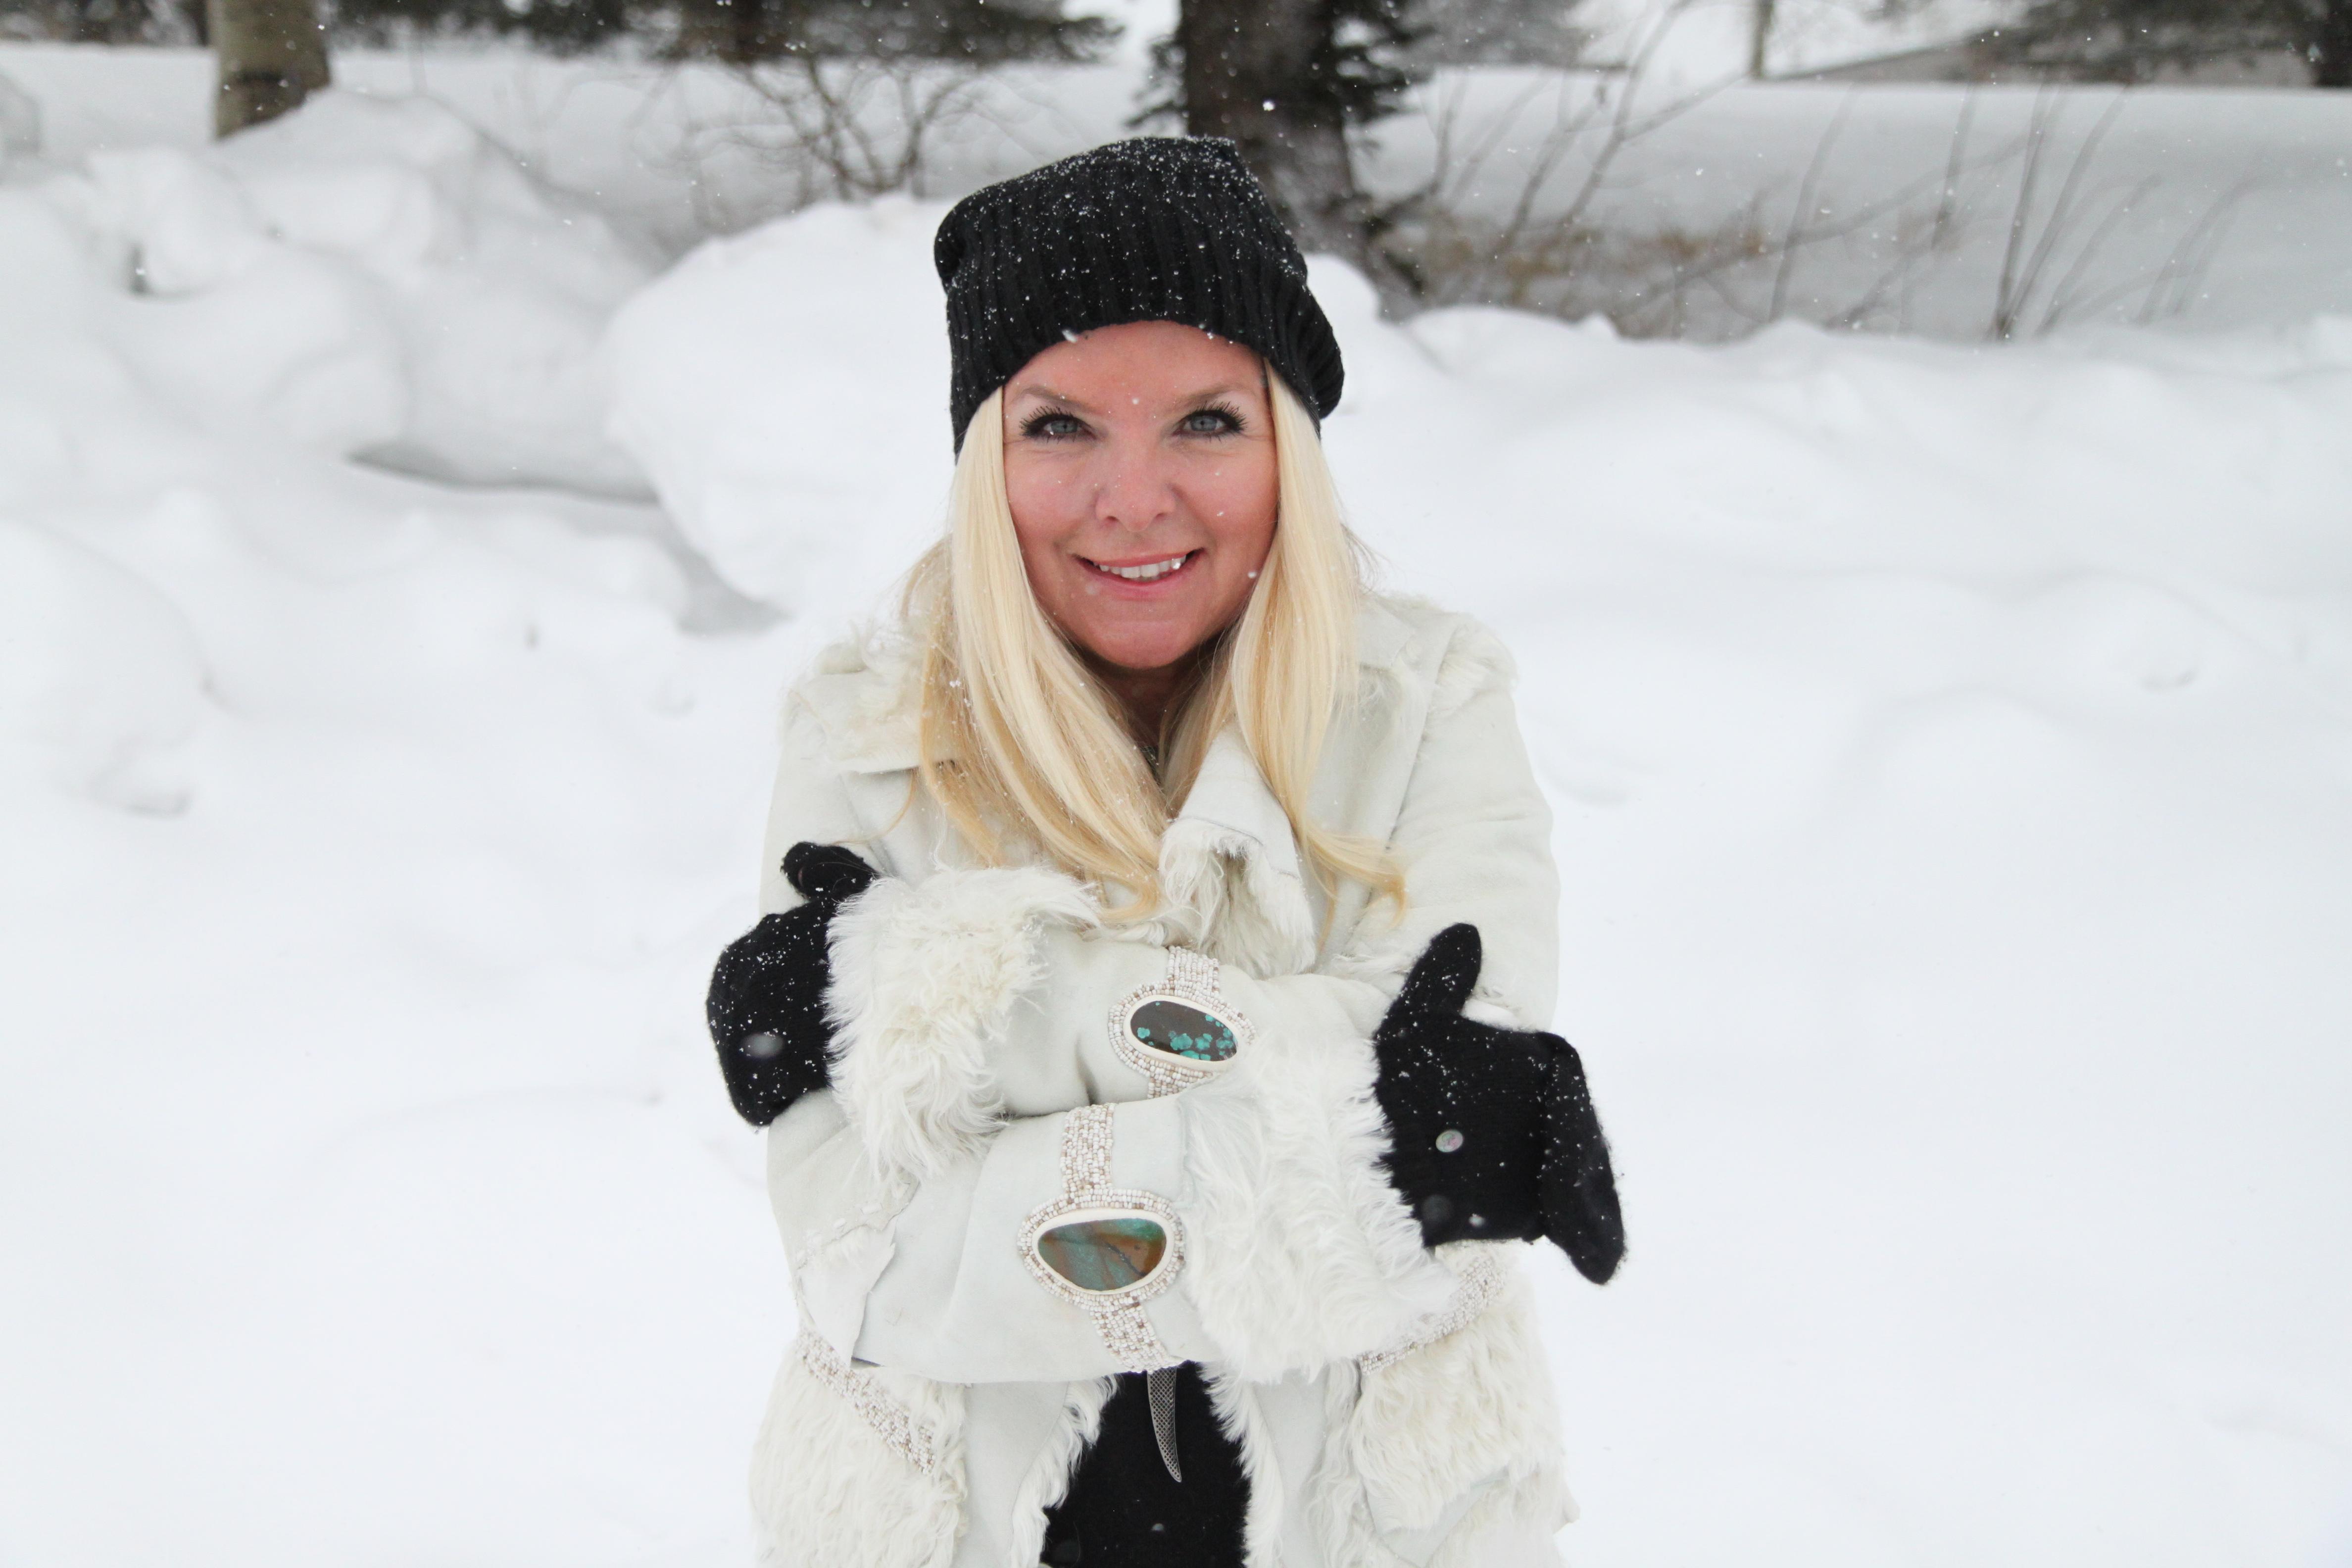 Gypset Style Apr 232 S Ski Wear Gypset Girl Explores The